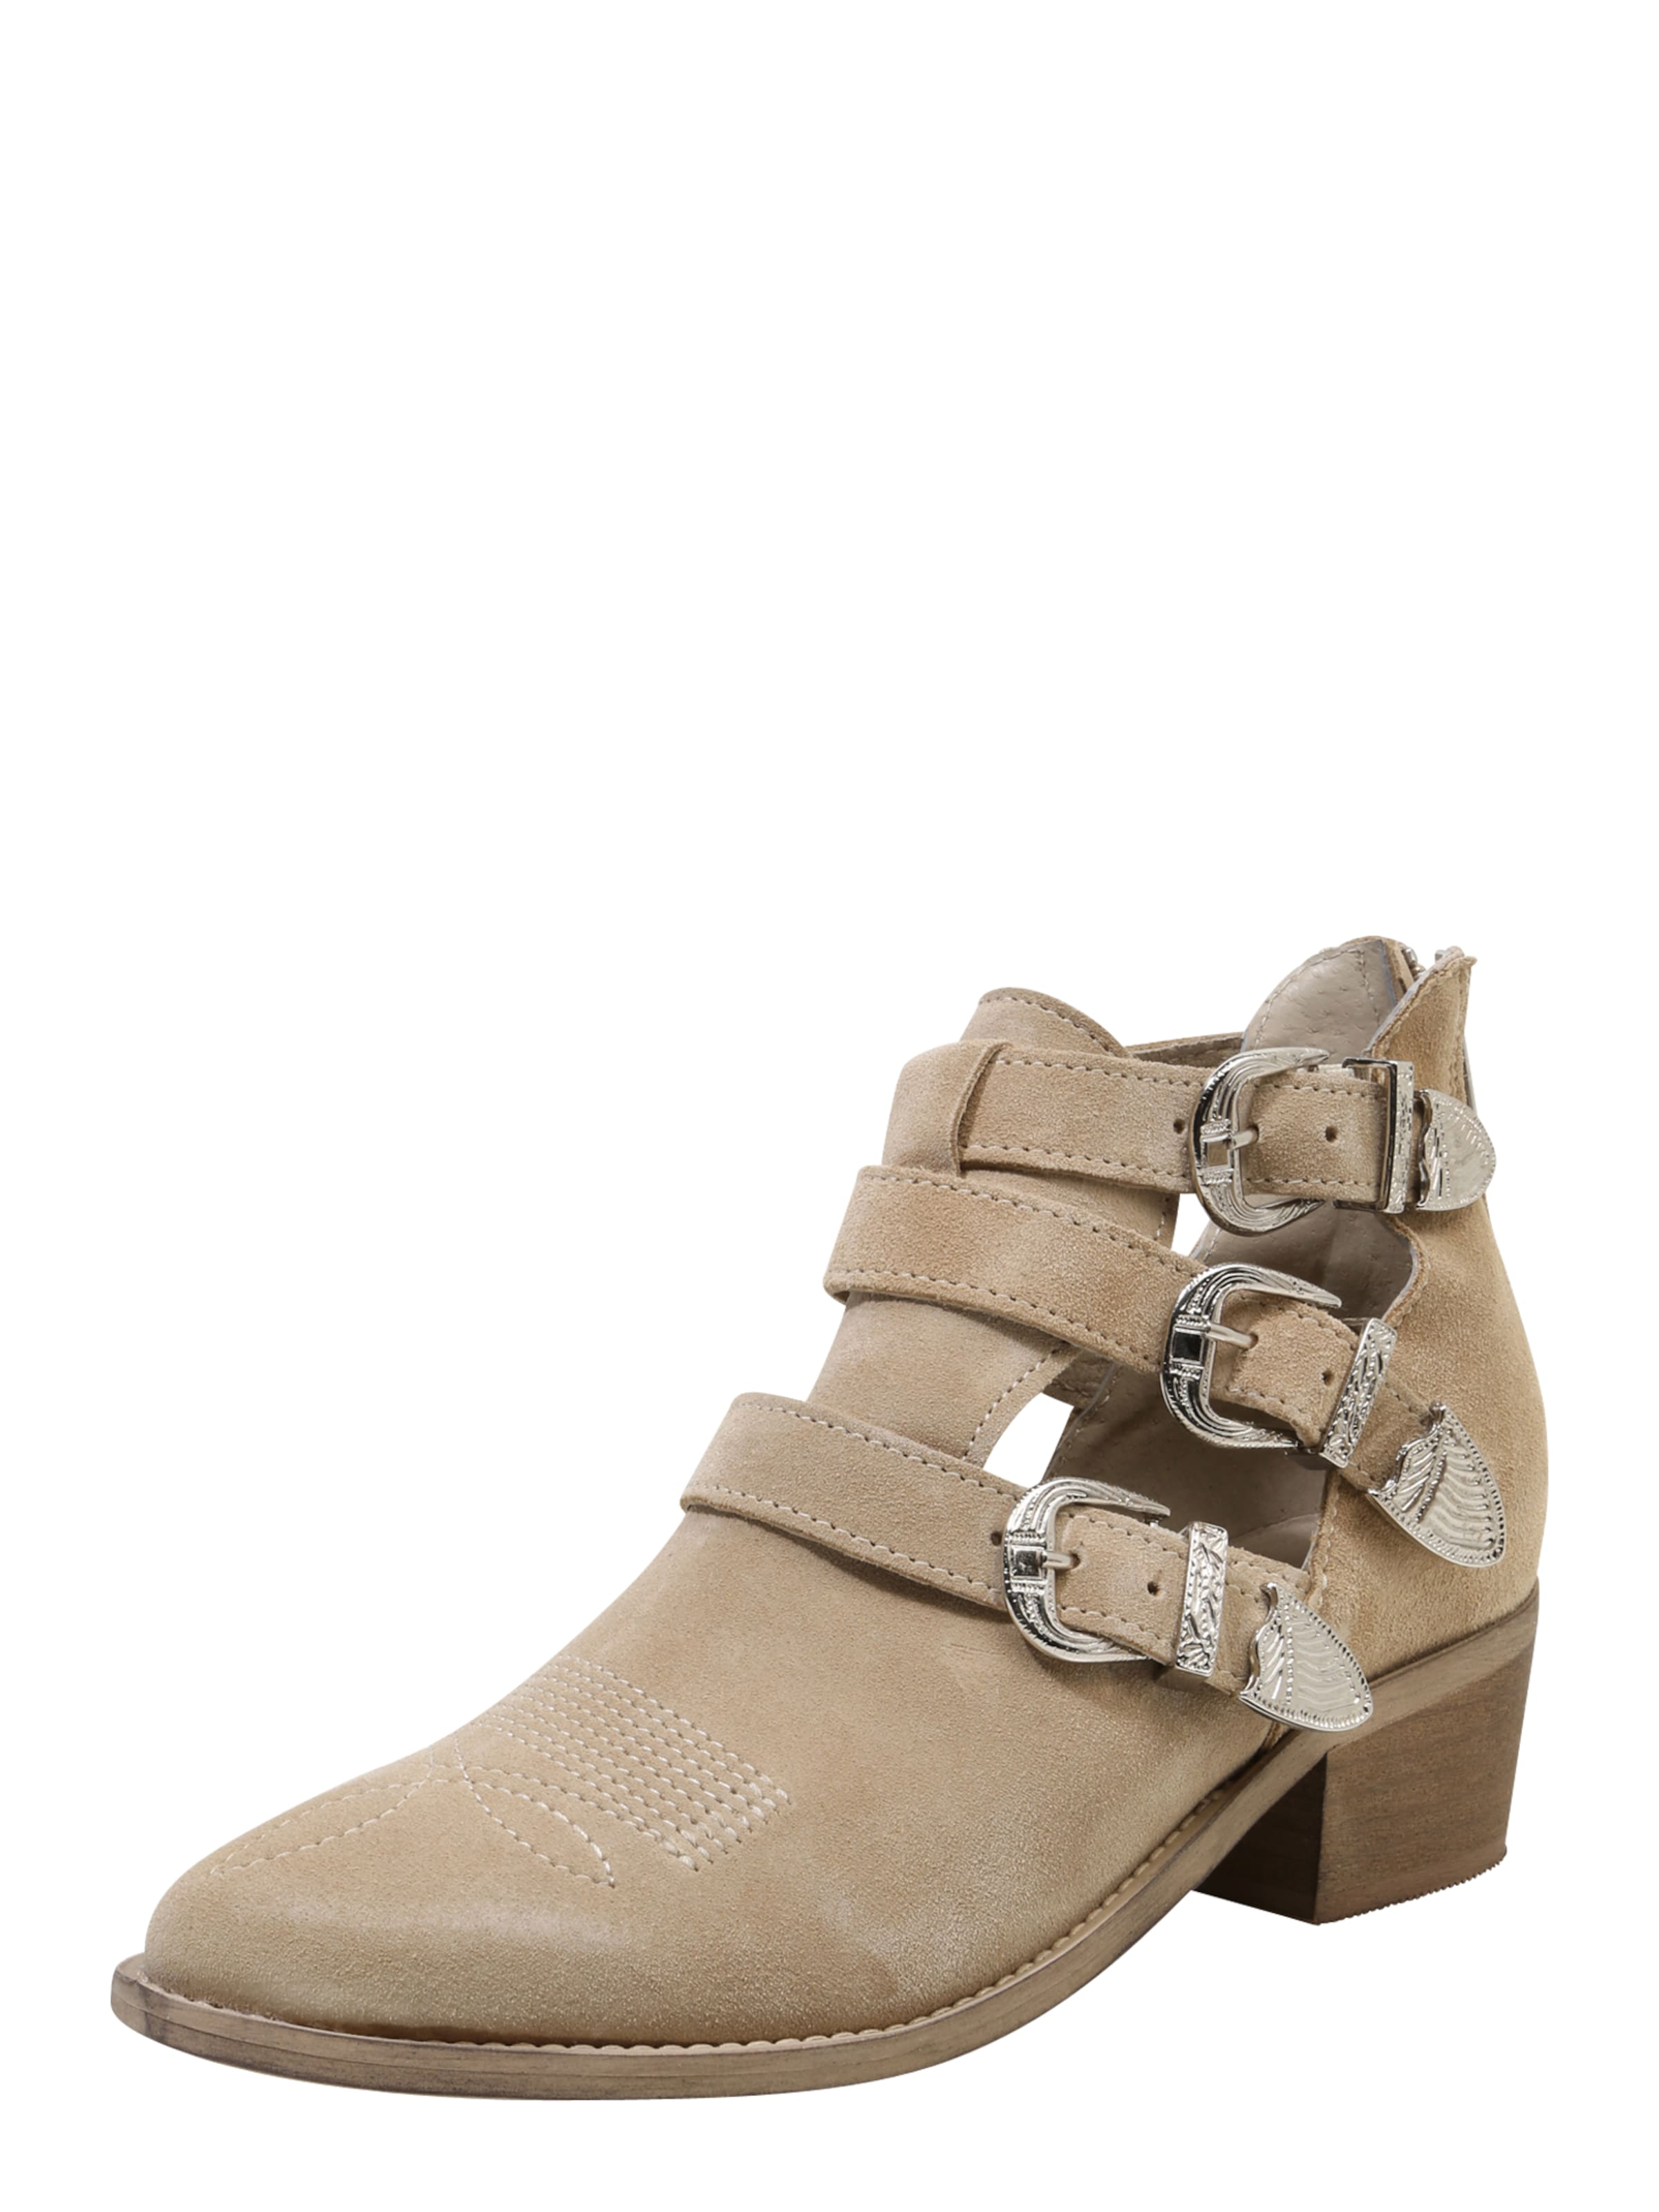 PAVEMENT Ankleboots  Carina cut